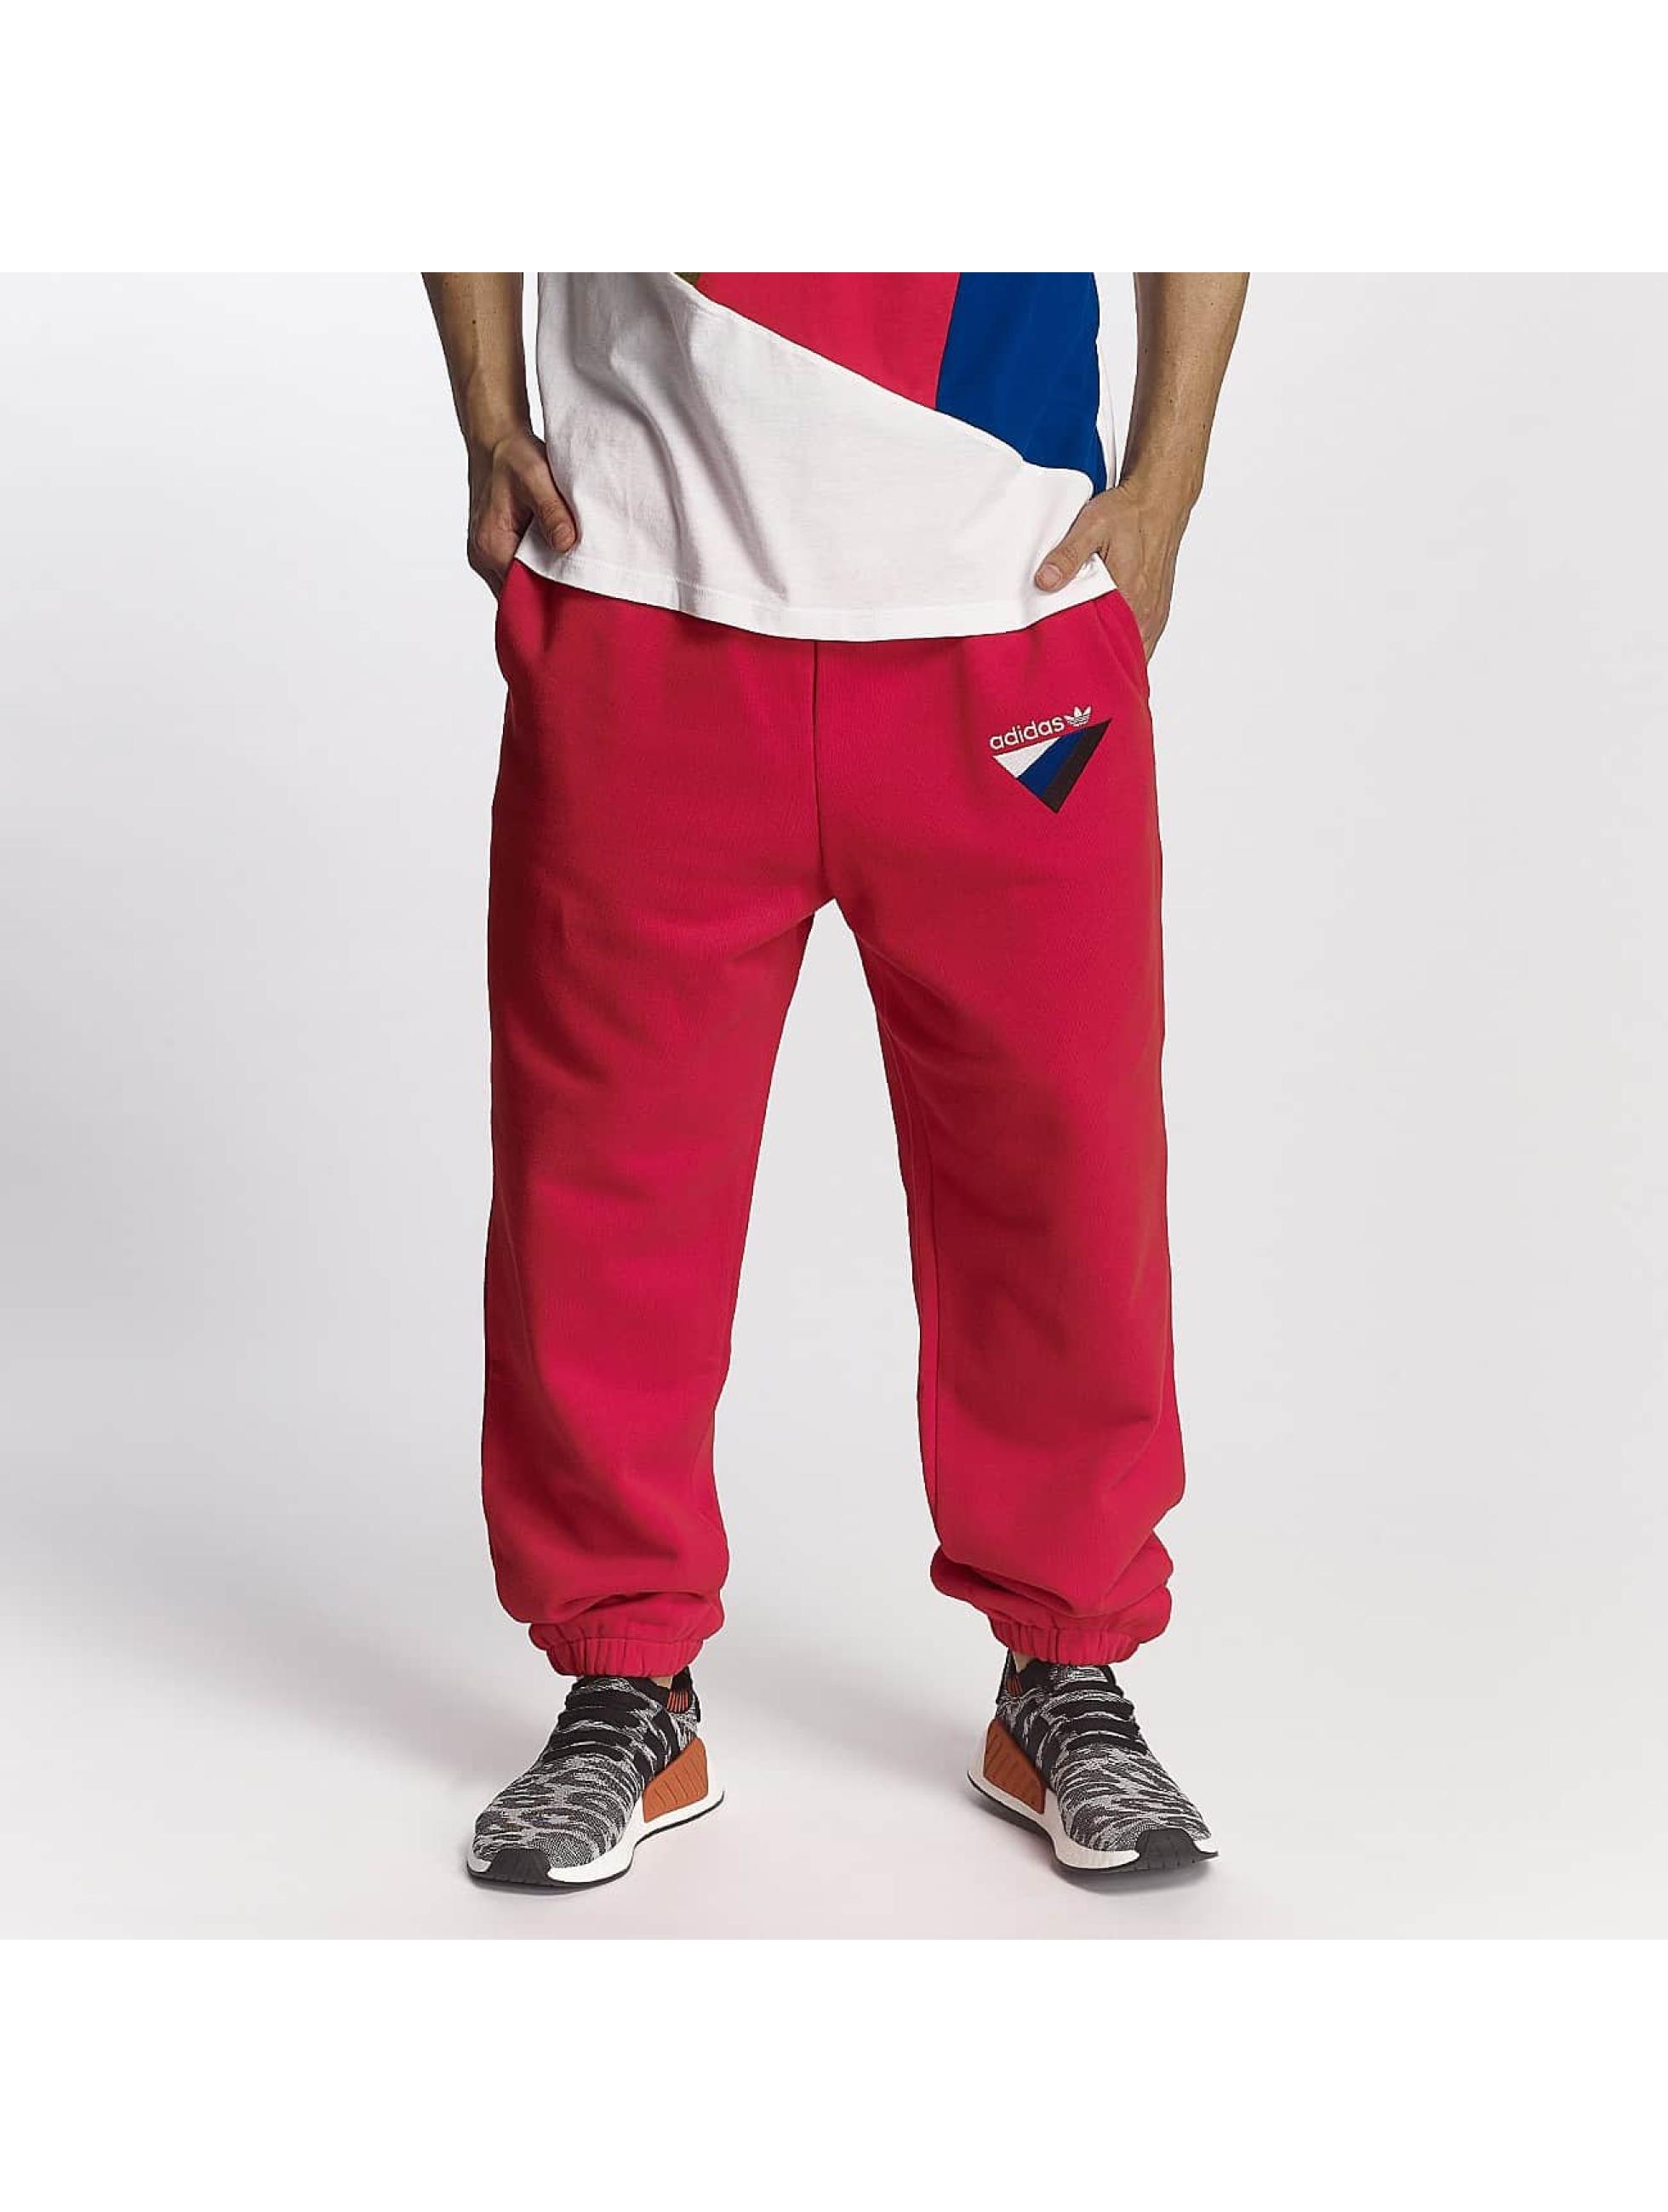 adidas Männer Jogginghose Anichkov in rot